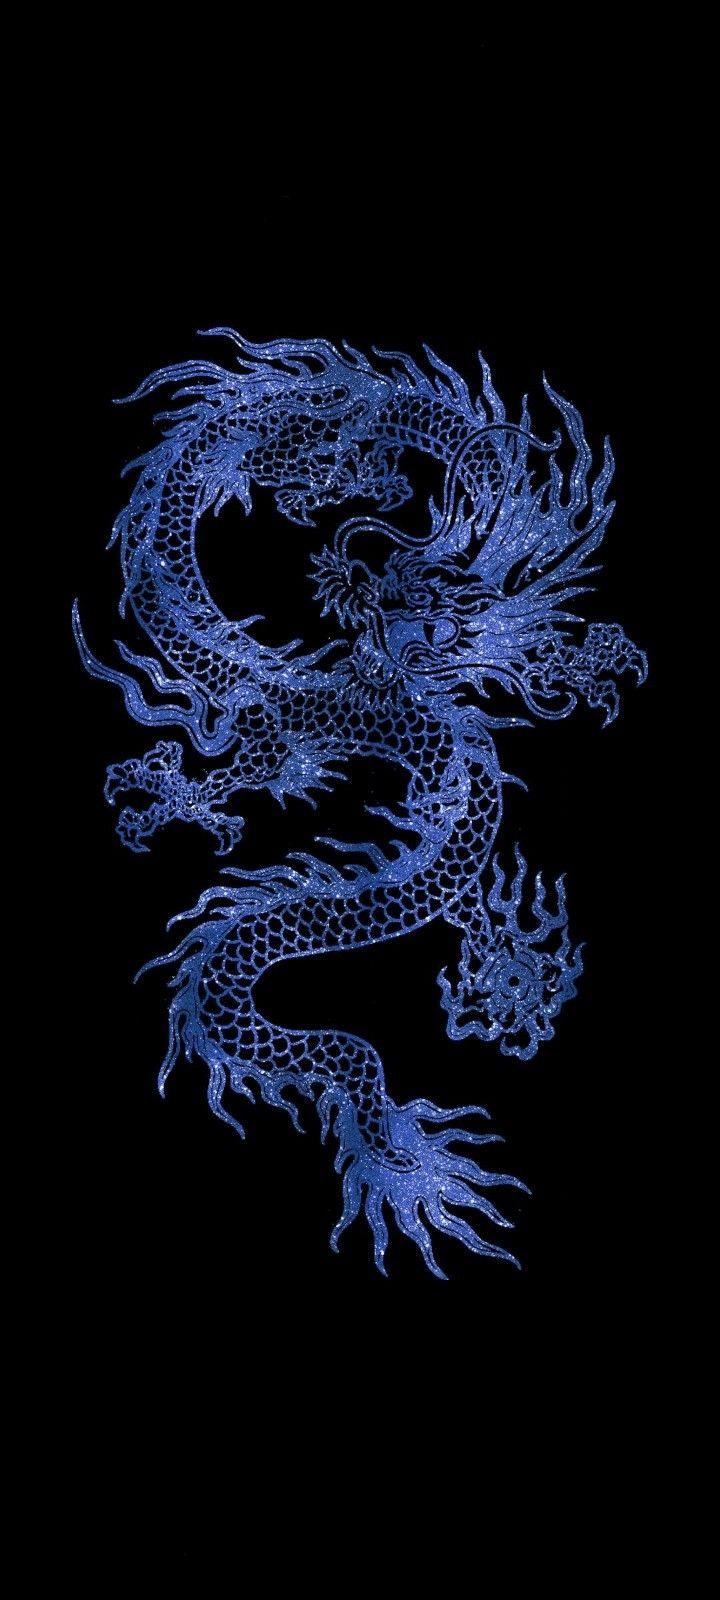 Dragon Wallpaper Dragon Wallpaper Iphone Dark Wallpaper Iphone Iphone Wallpaper Vintage